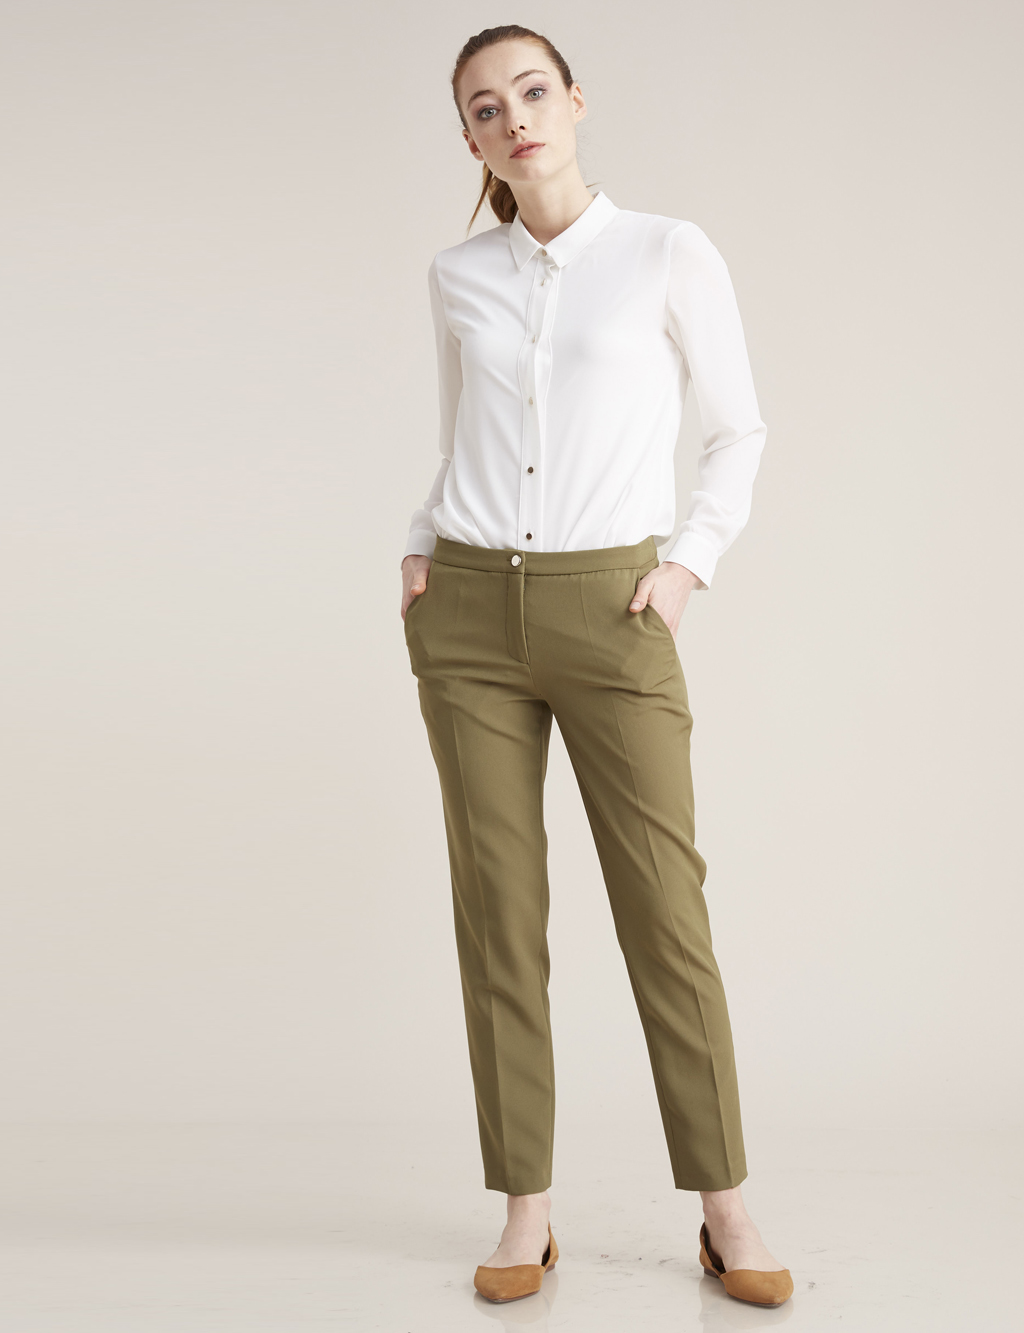 Kayra Giyim Basic Pantolon Haki